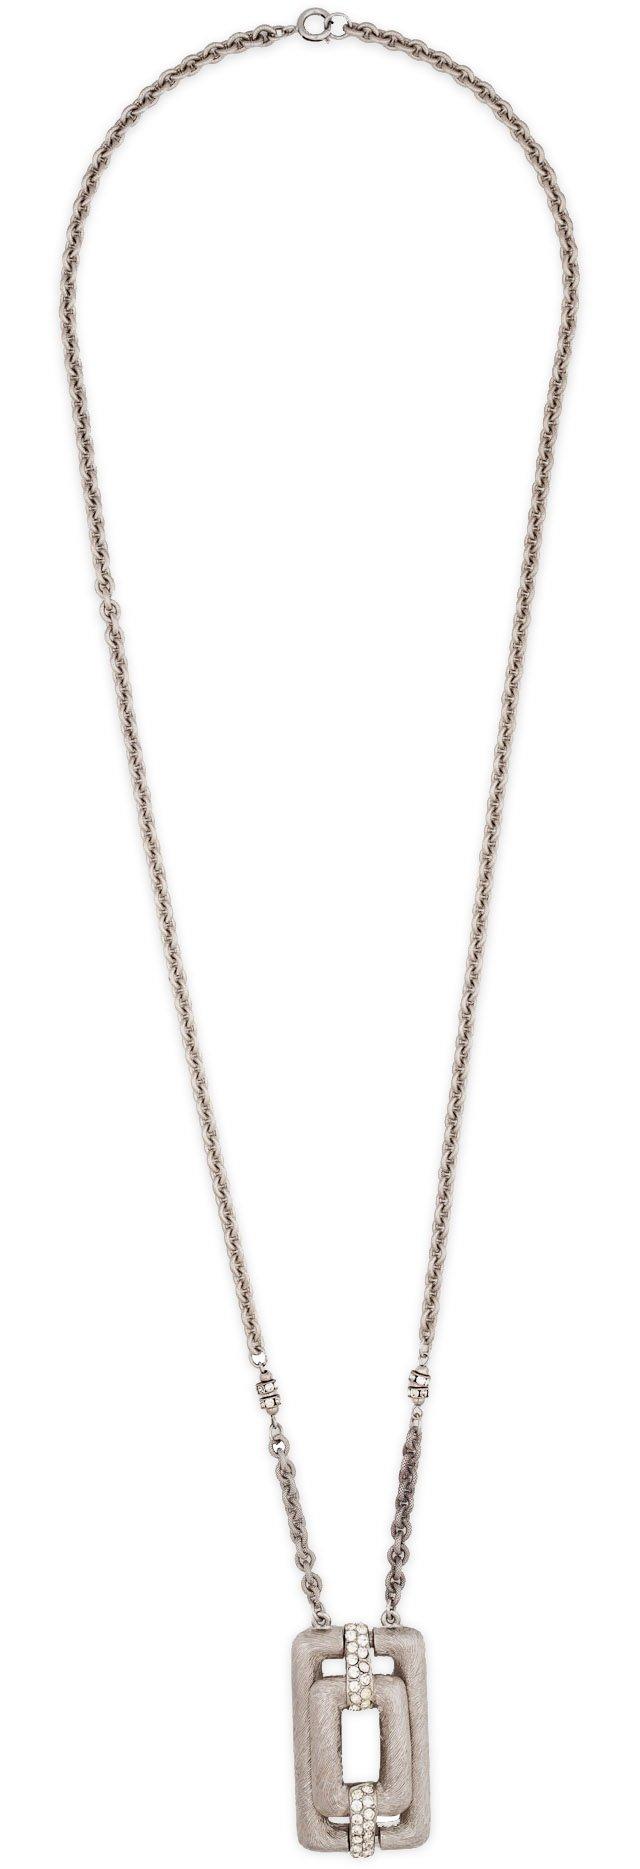 Castlecliff Necklace